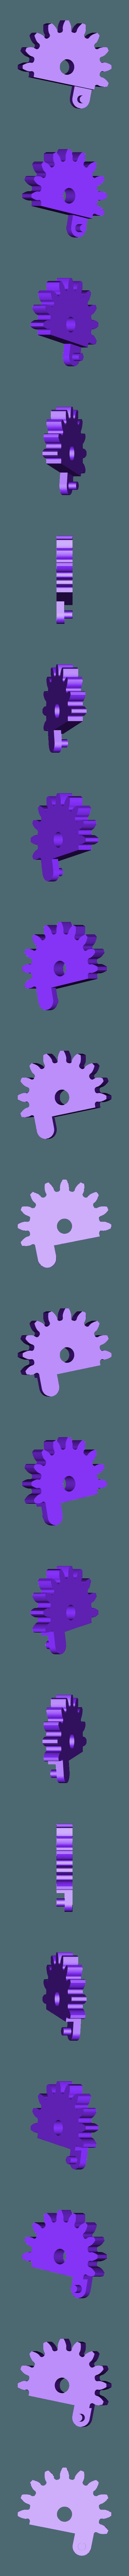 Spur_Gear_L.stl Download free STL file Mechanical Quick Grab/Release Phone Stand • 3D printable object, arron_mollet22